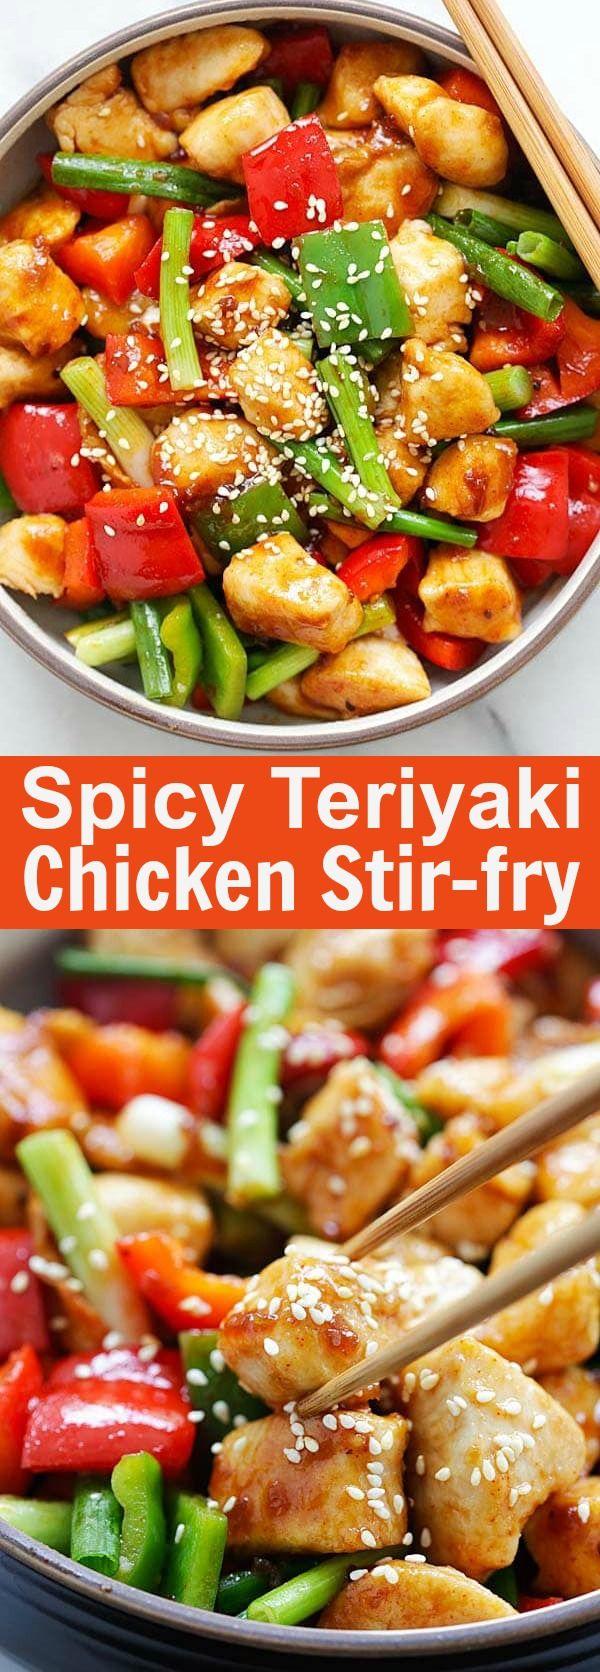 Spicy Teriyaki Chicken Stir Fry – easy and authentic Asian chicken stir fry with Annie Chun's Teriyaki Sauce and Korean Gochujang. So delicious | rasamalaysia.com